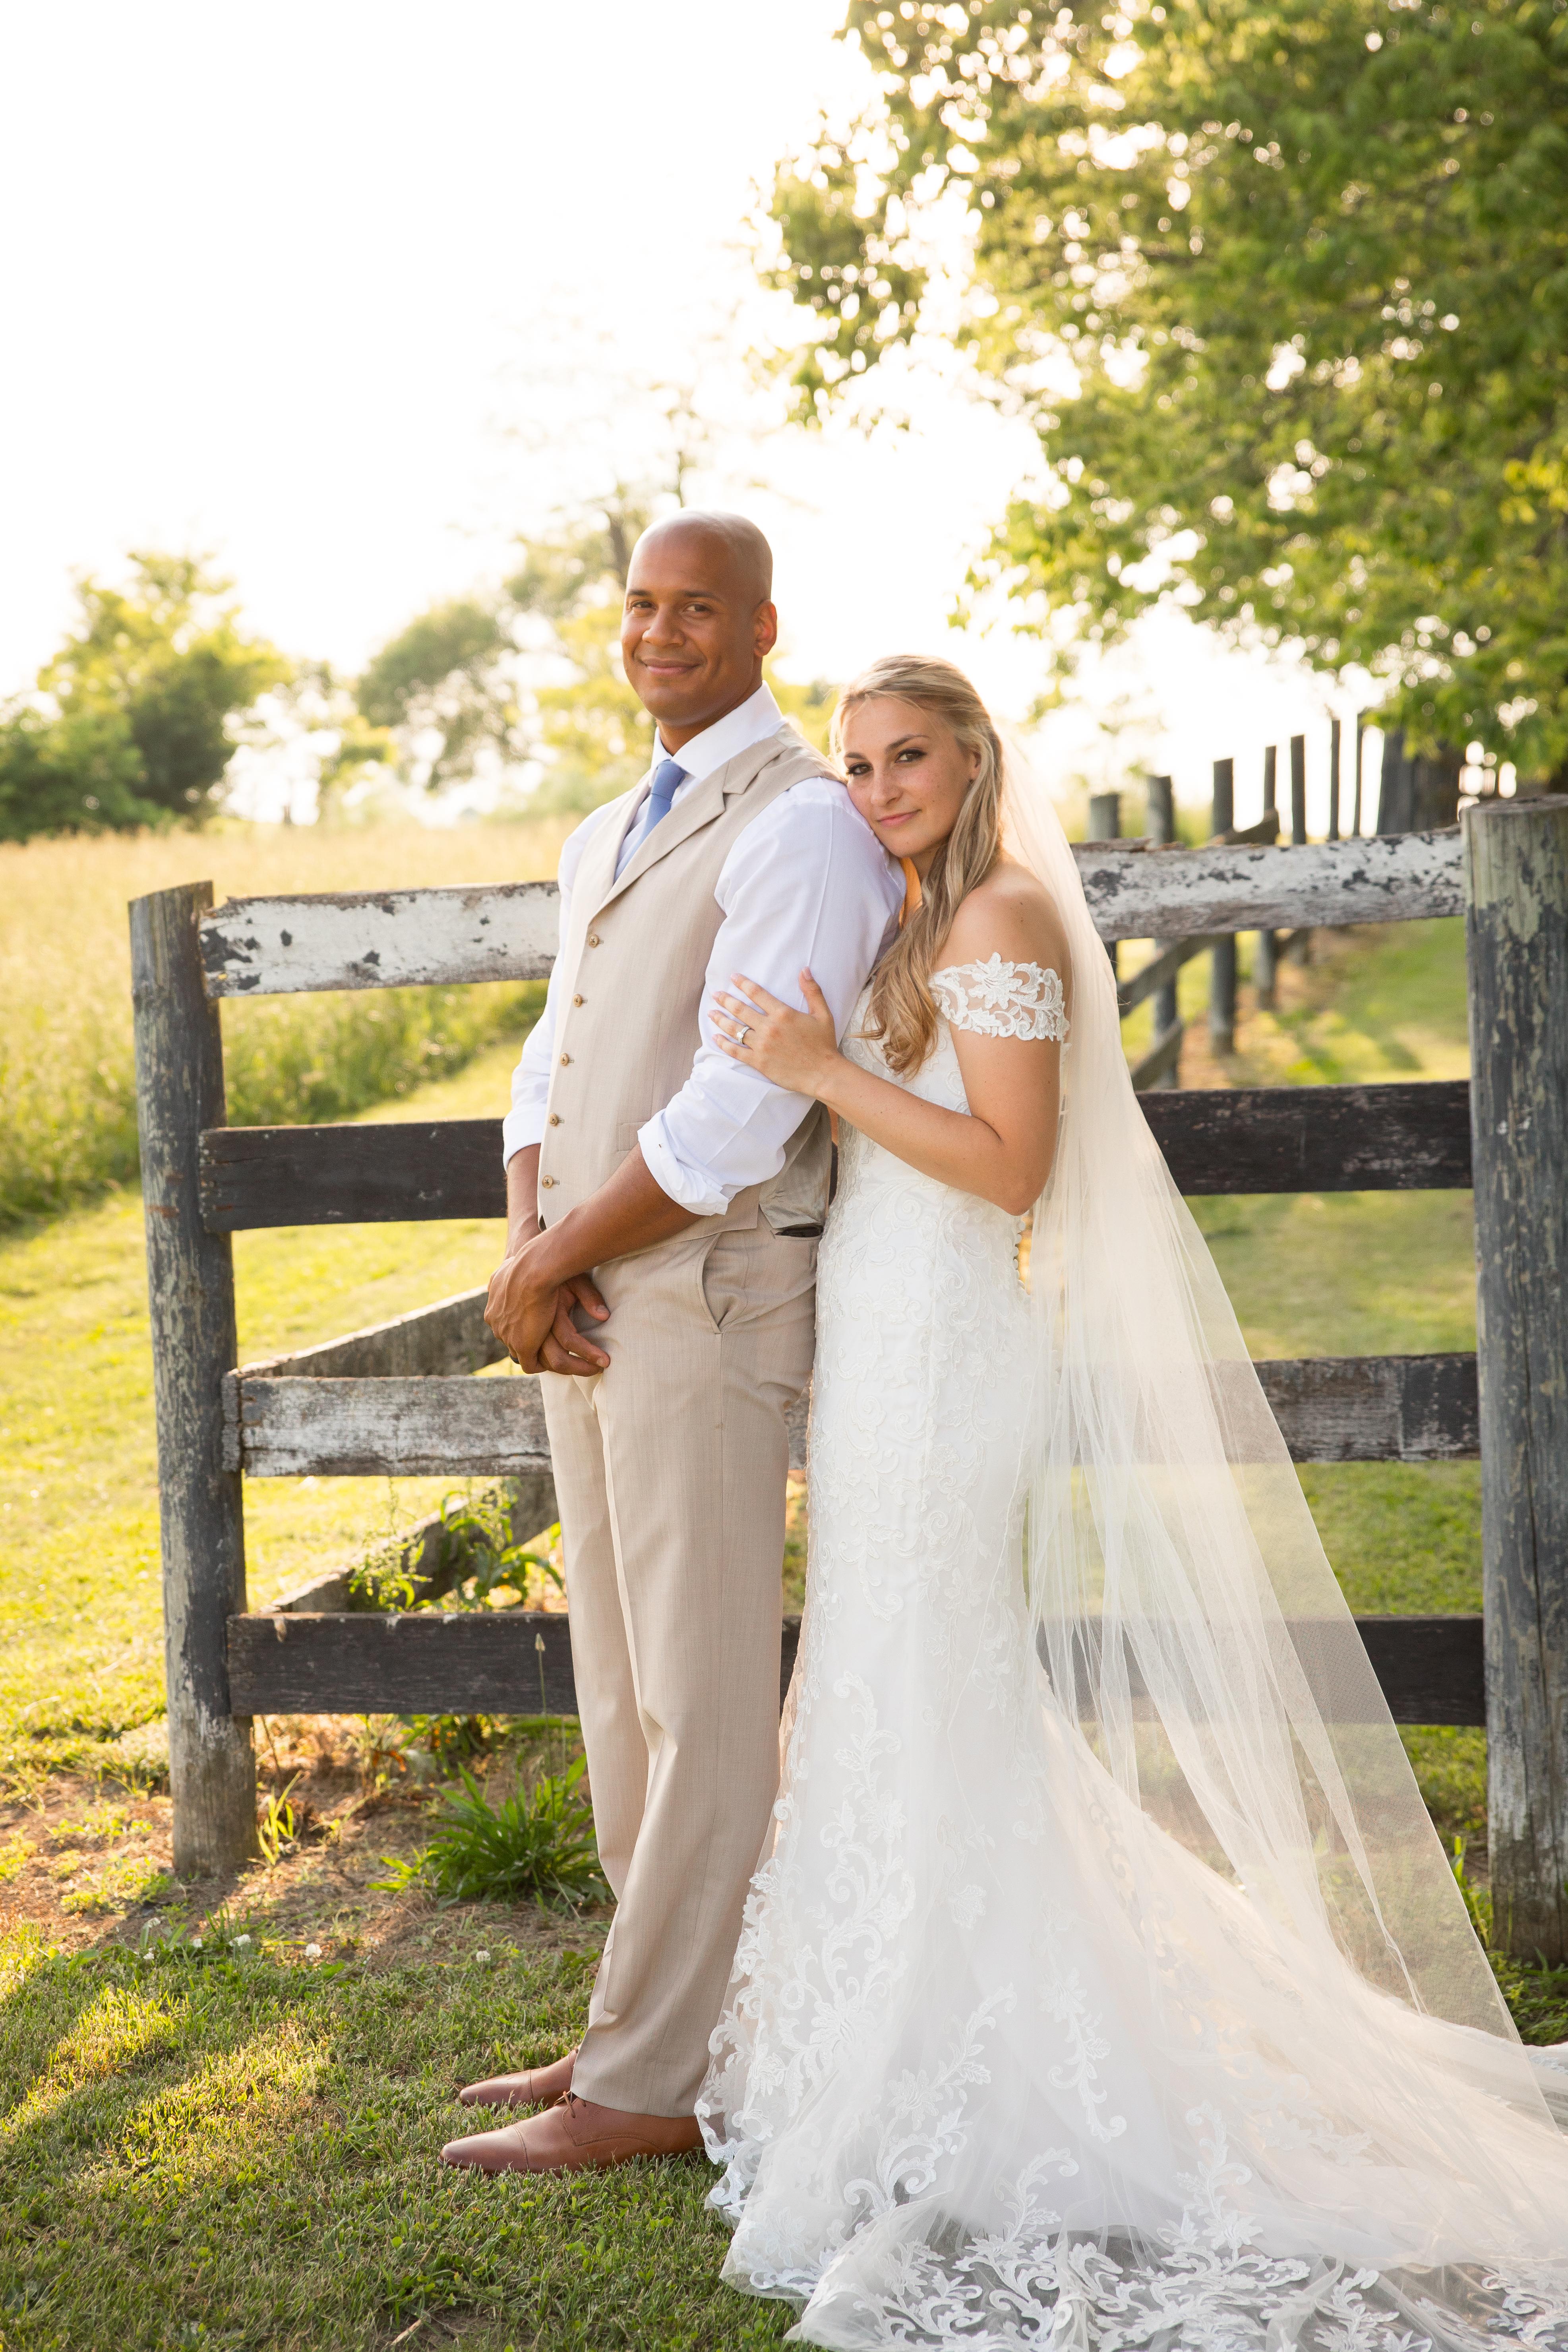 Kentucky farm wedding, bride and groom